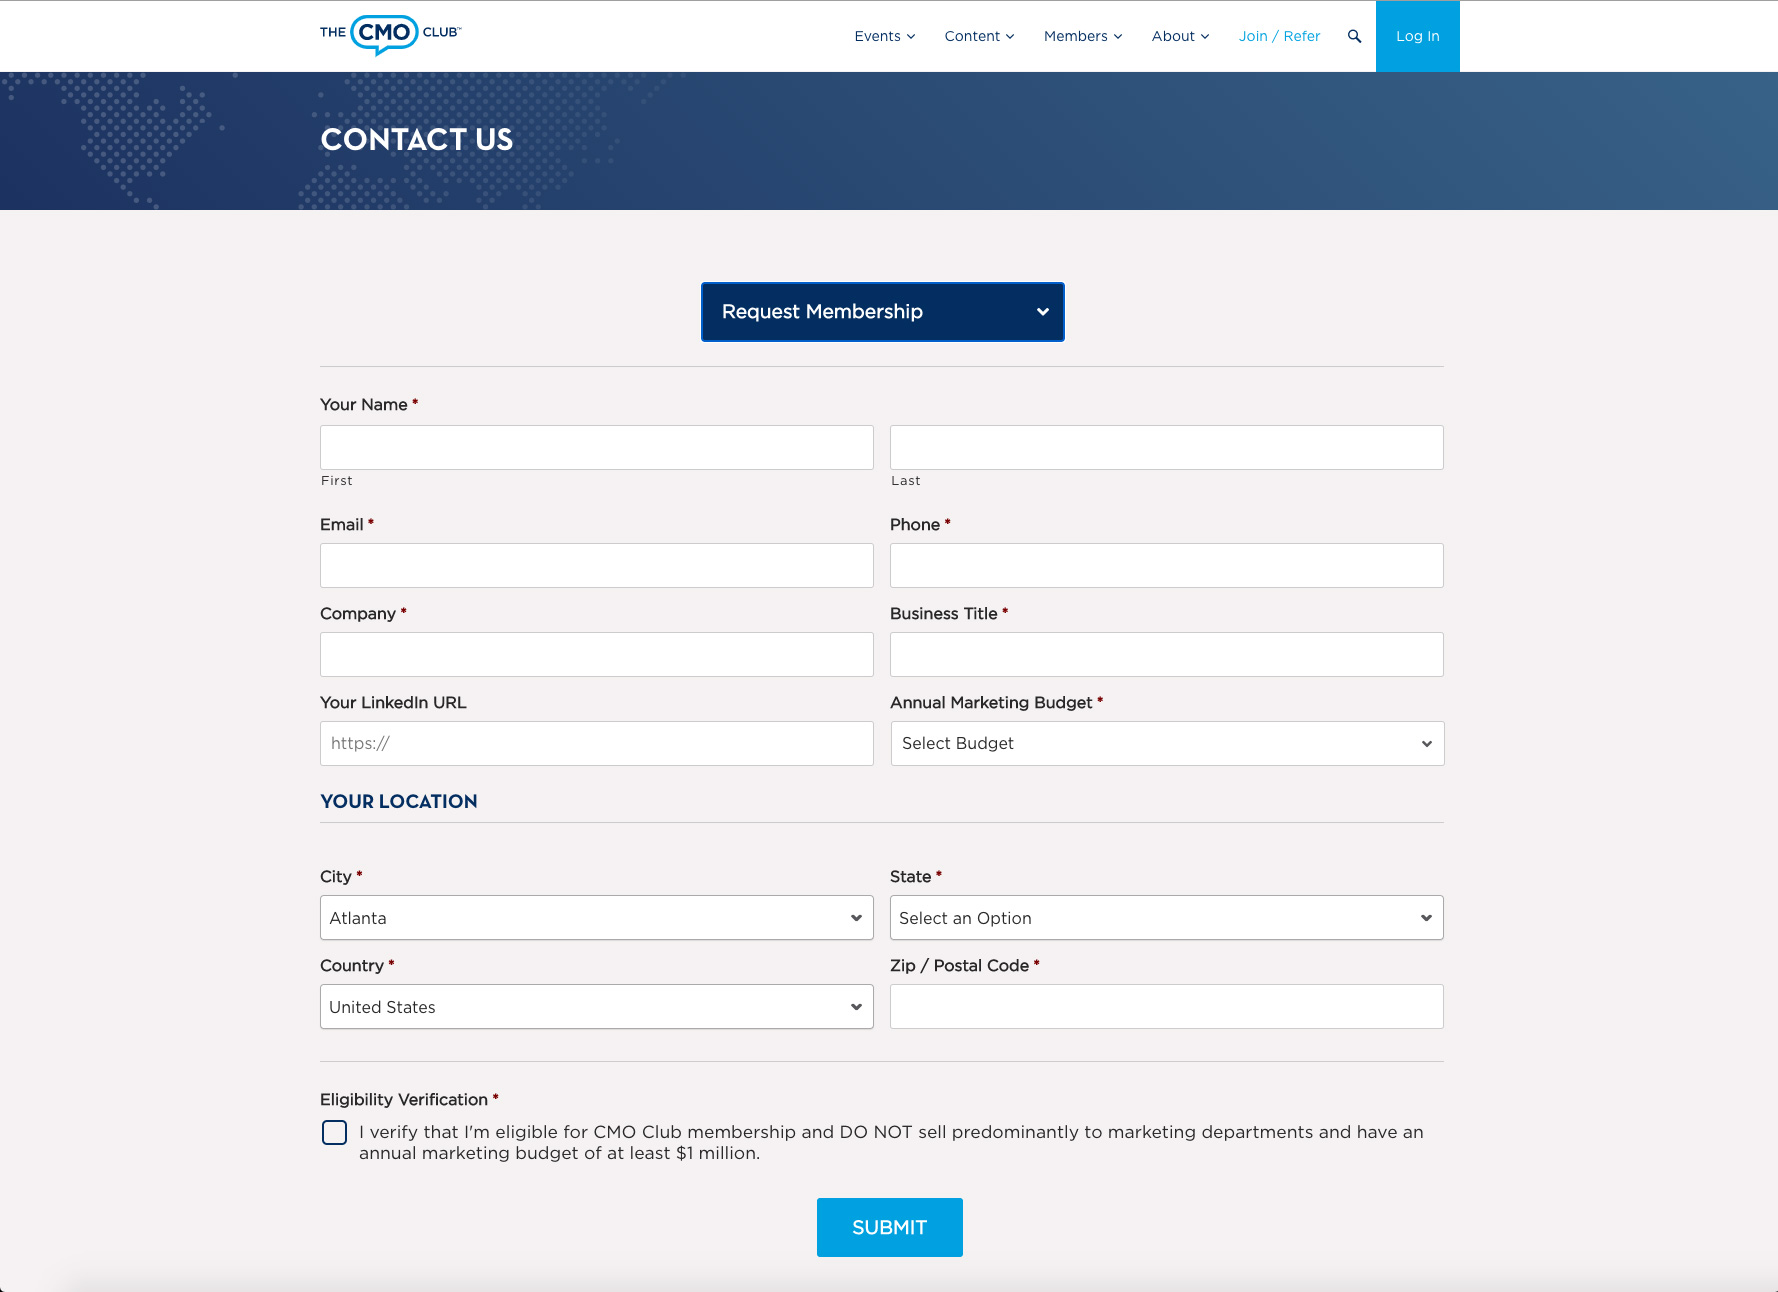 The CMO Club Website Screenshot